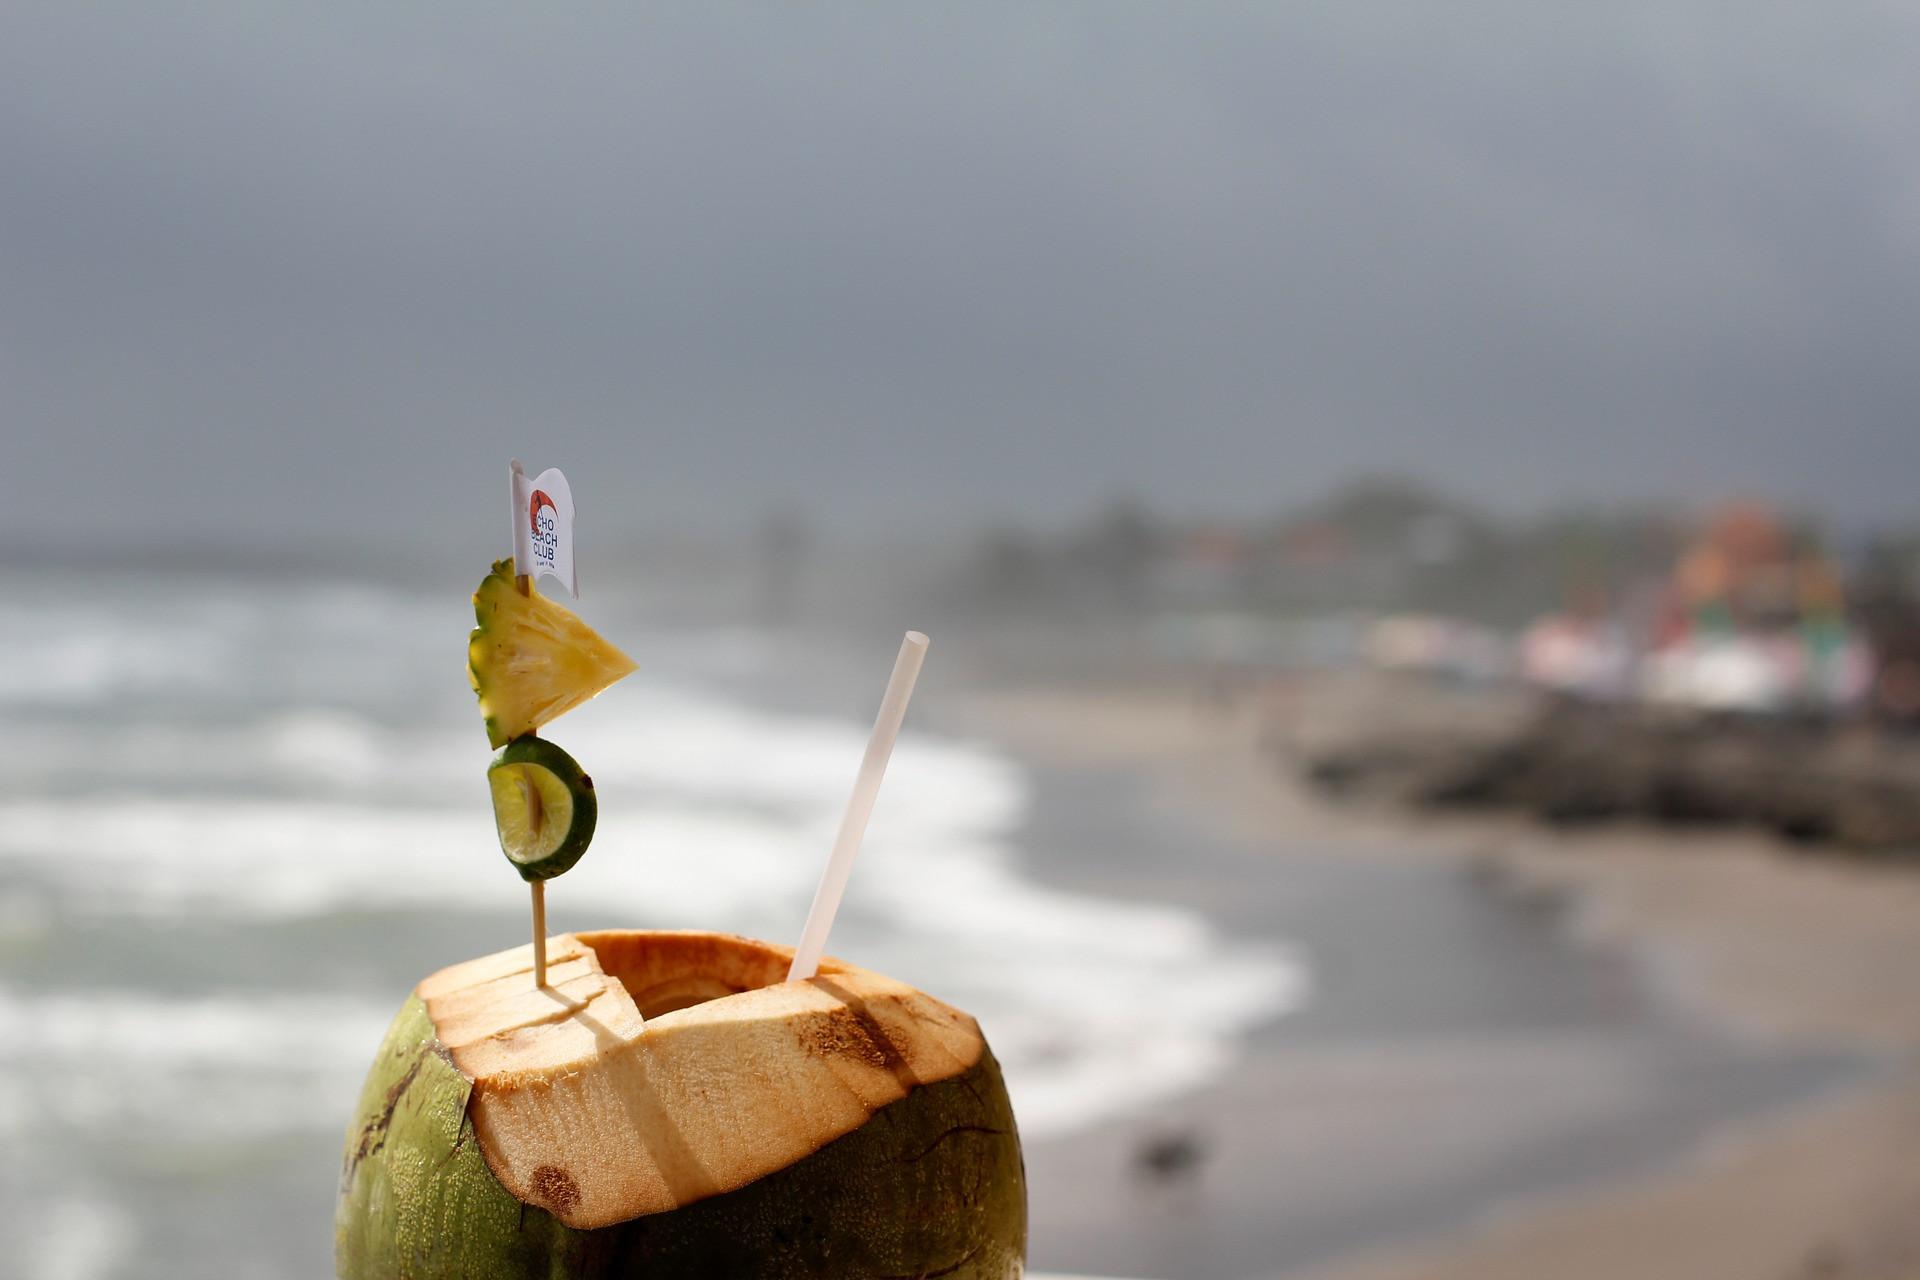 Kombinasi Air Kelapa dengan 4 Bahan Alami Ini Ampuh Usir Berbagai Penyakit - JPNN.com